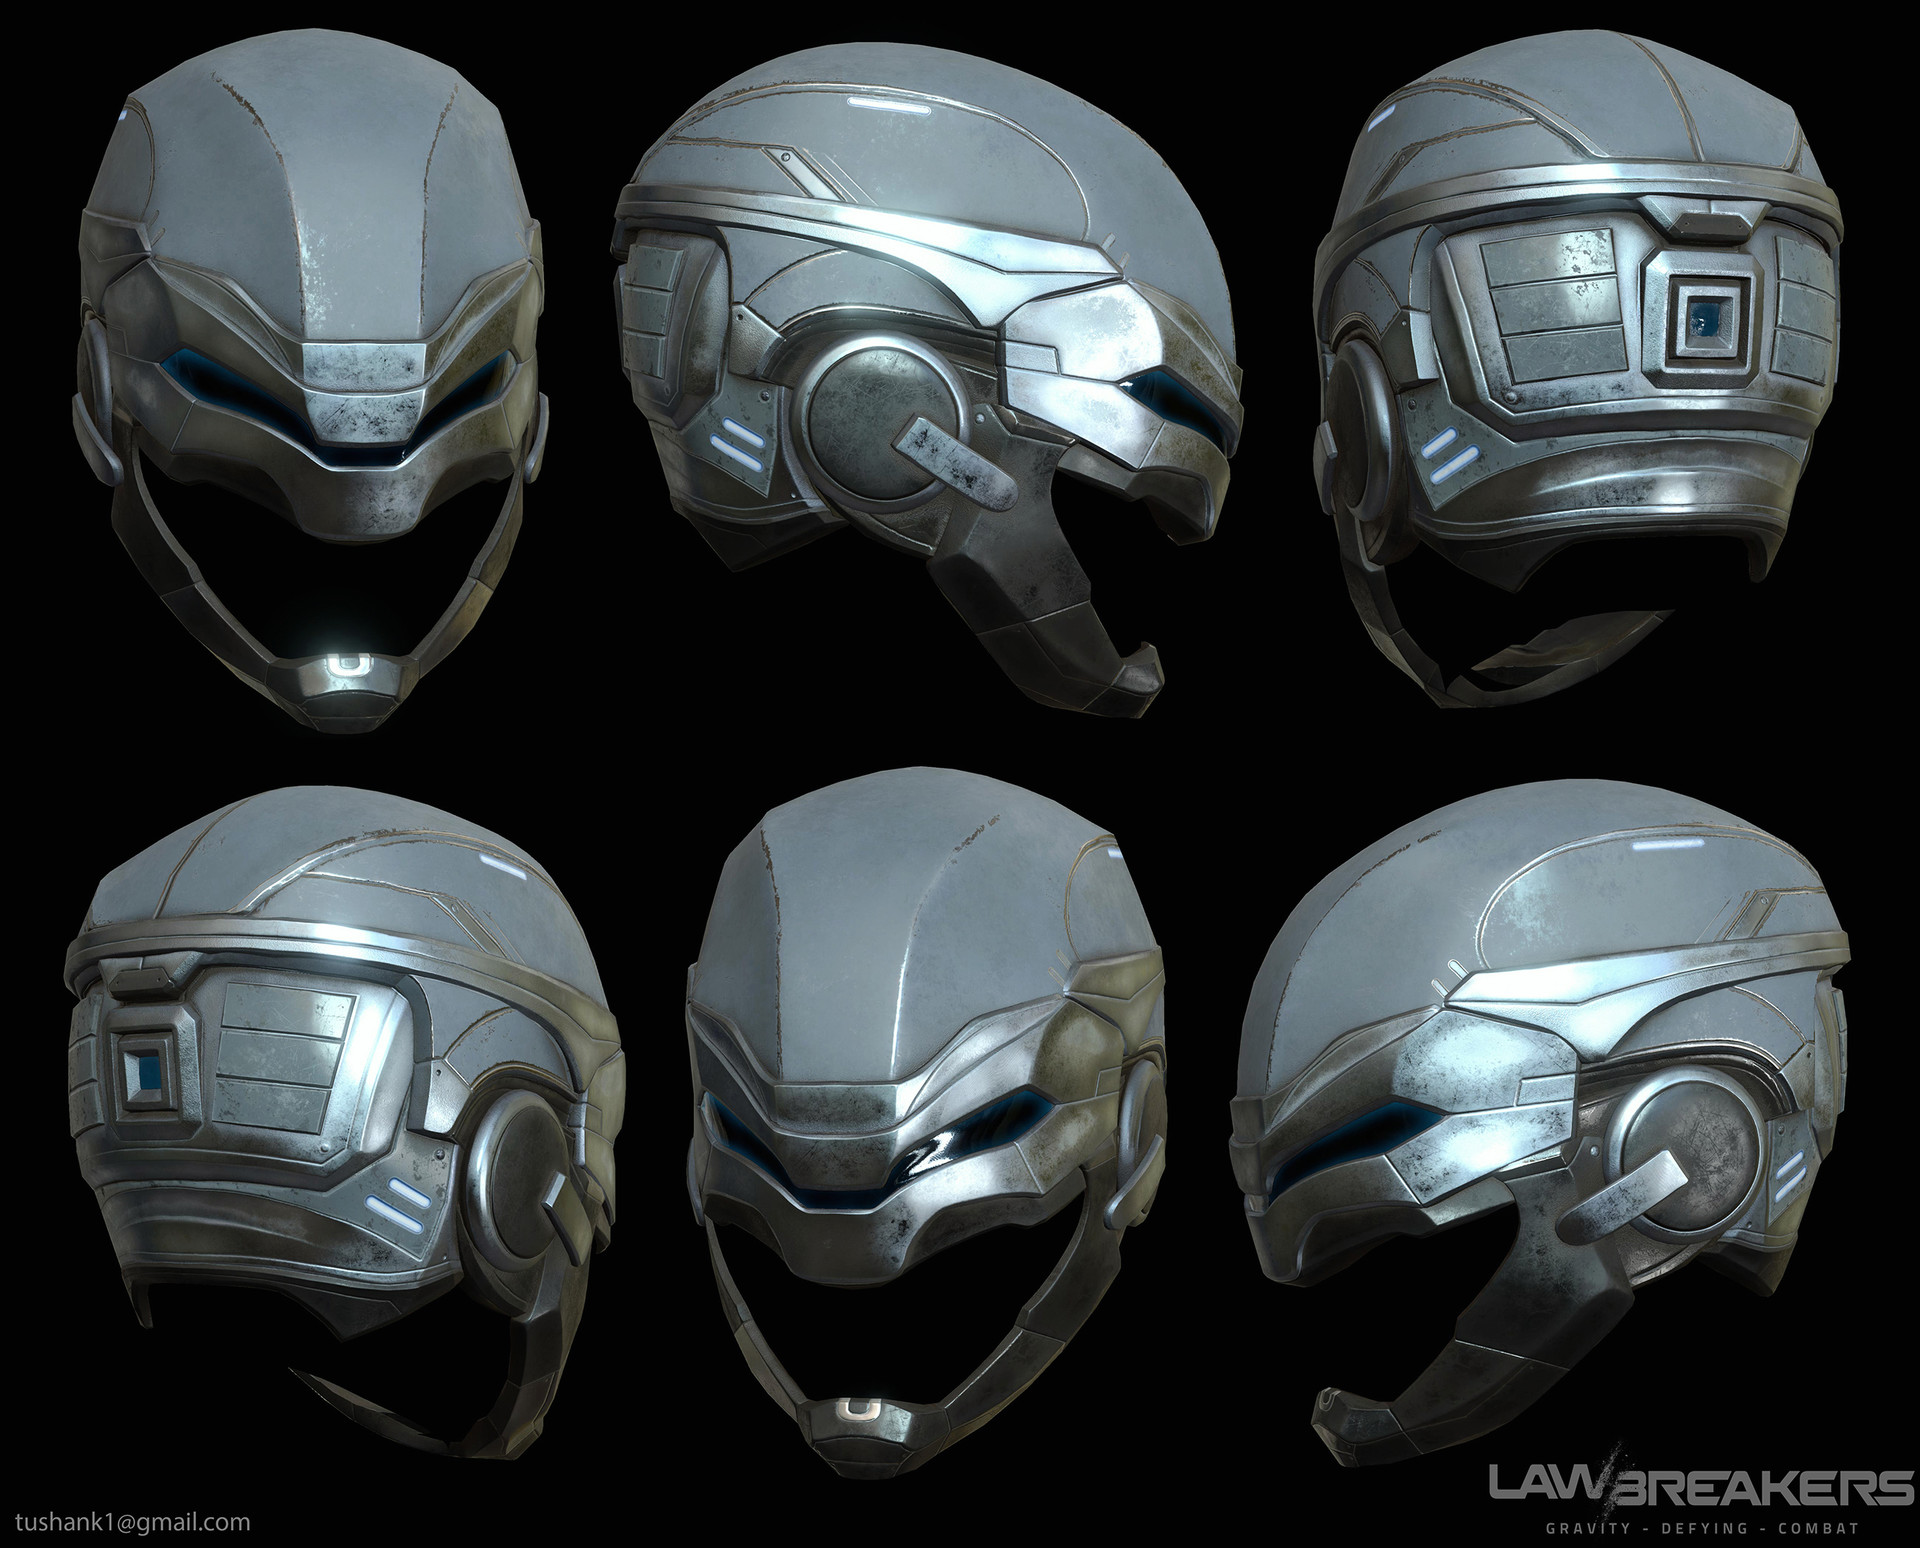 Tushank k jaiswal battle medic tier 3 helmet 1